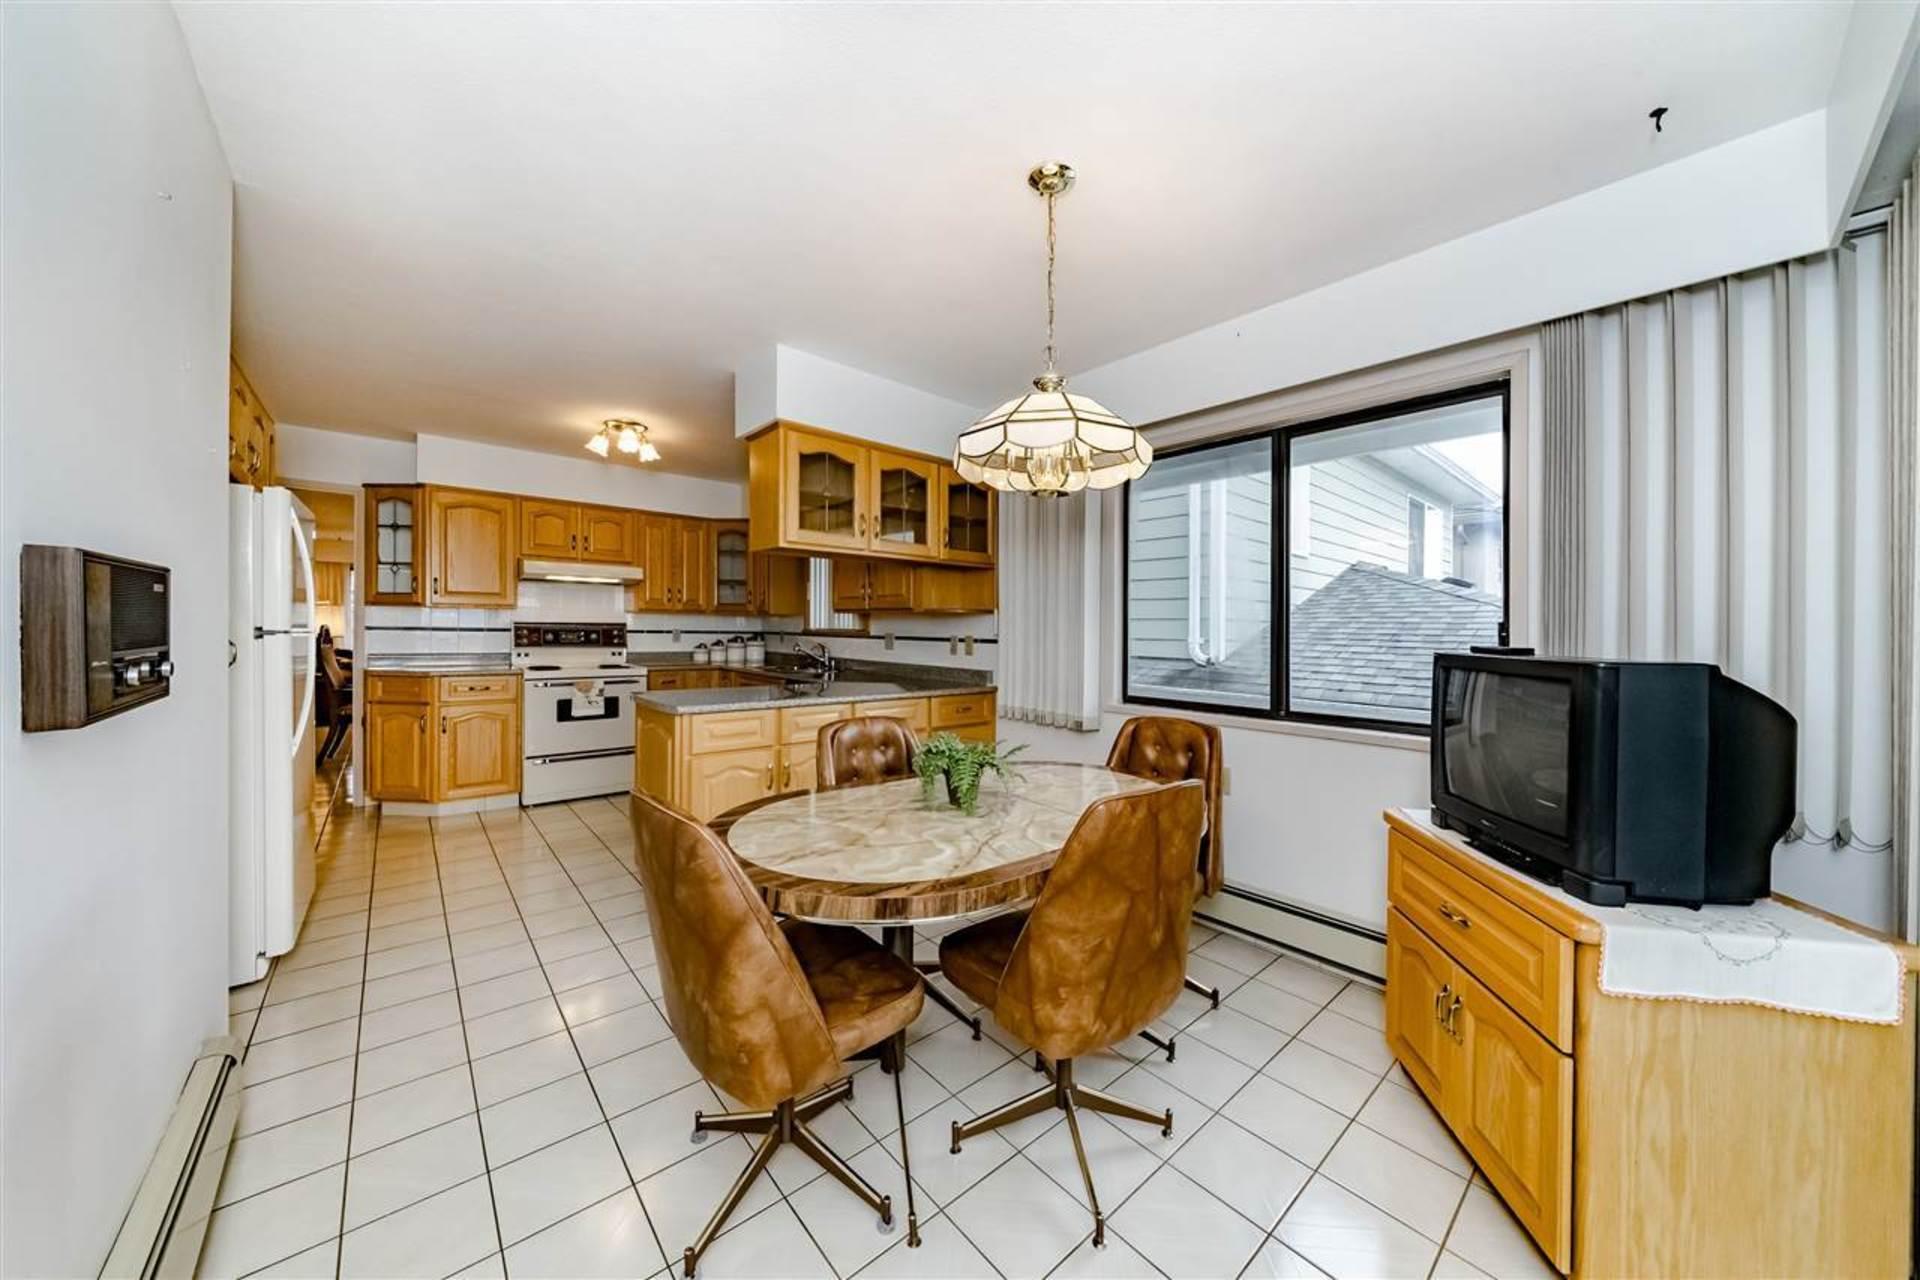 4730-union-street-willingdon-heights-burnaby-north-13 at 4730 Union Street, Willingdon Heights, Burnaby North